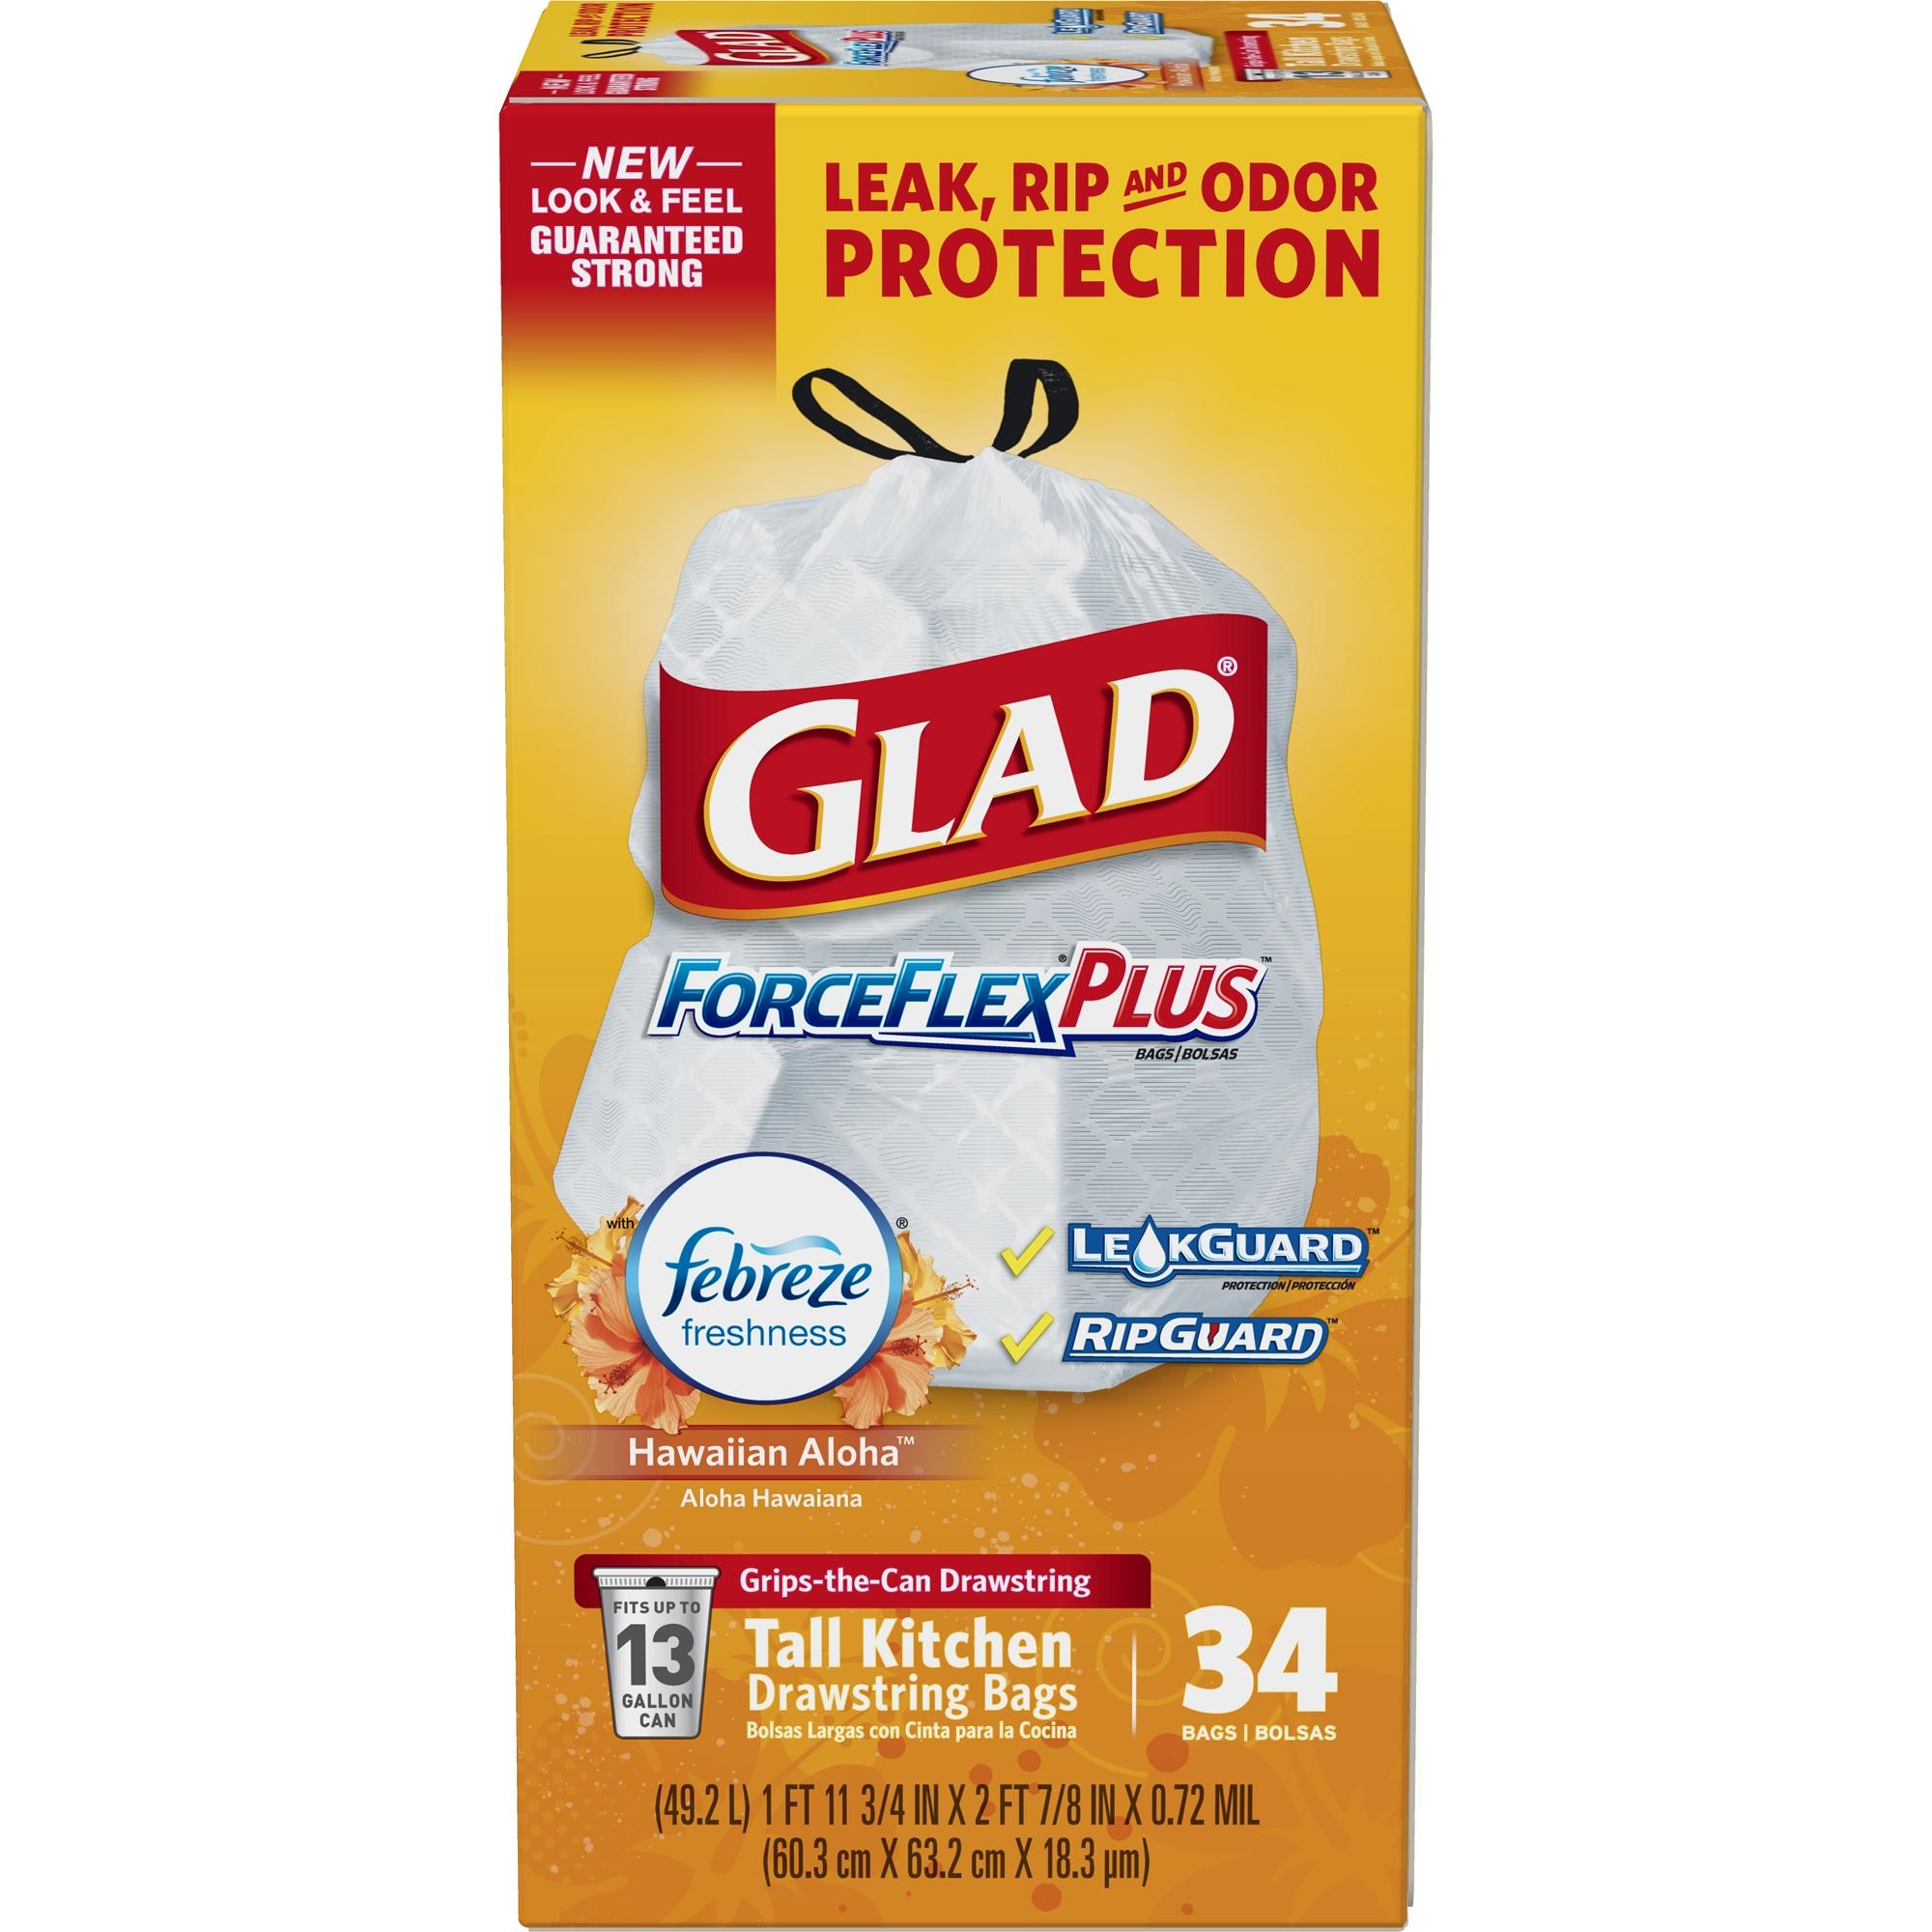 Glad ForceFlexPlus Tall Kitchen Drawstring Trash Bags - Febreze Hawaiian Aloha- 13 Gallon - 34 ct